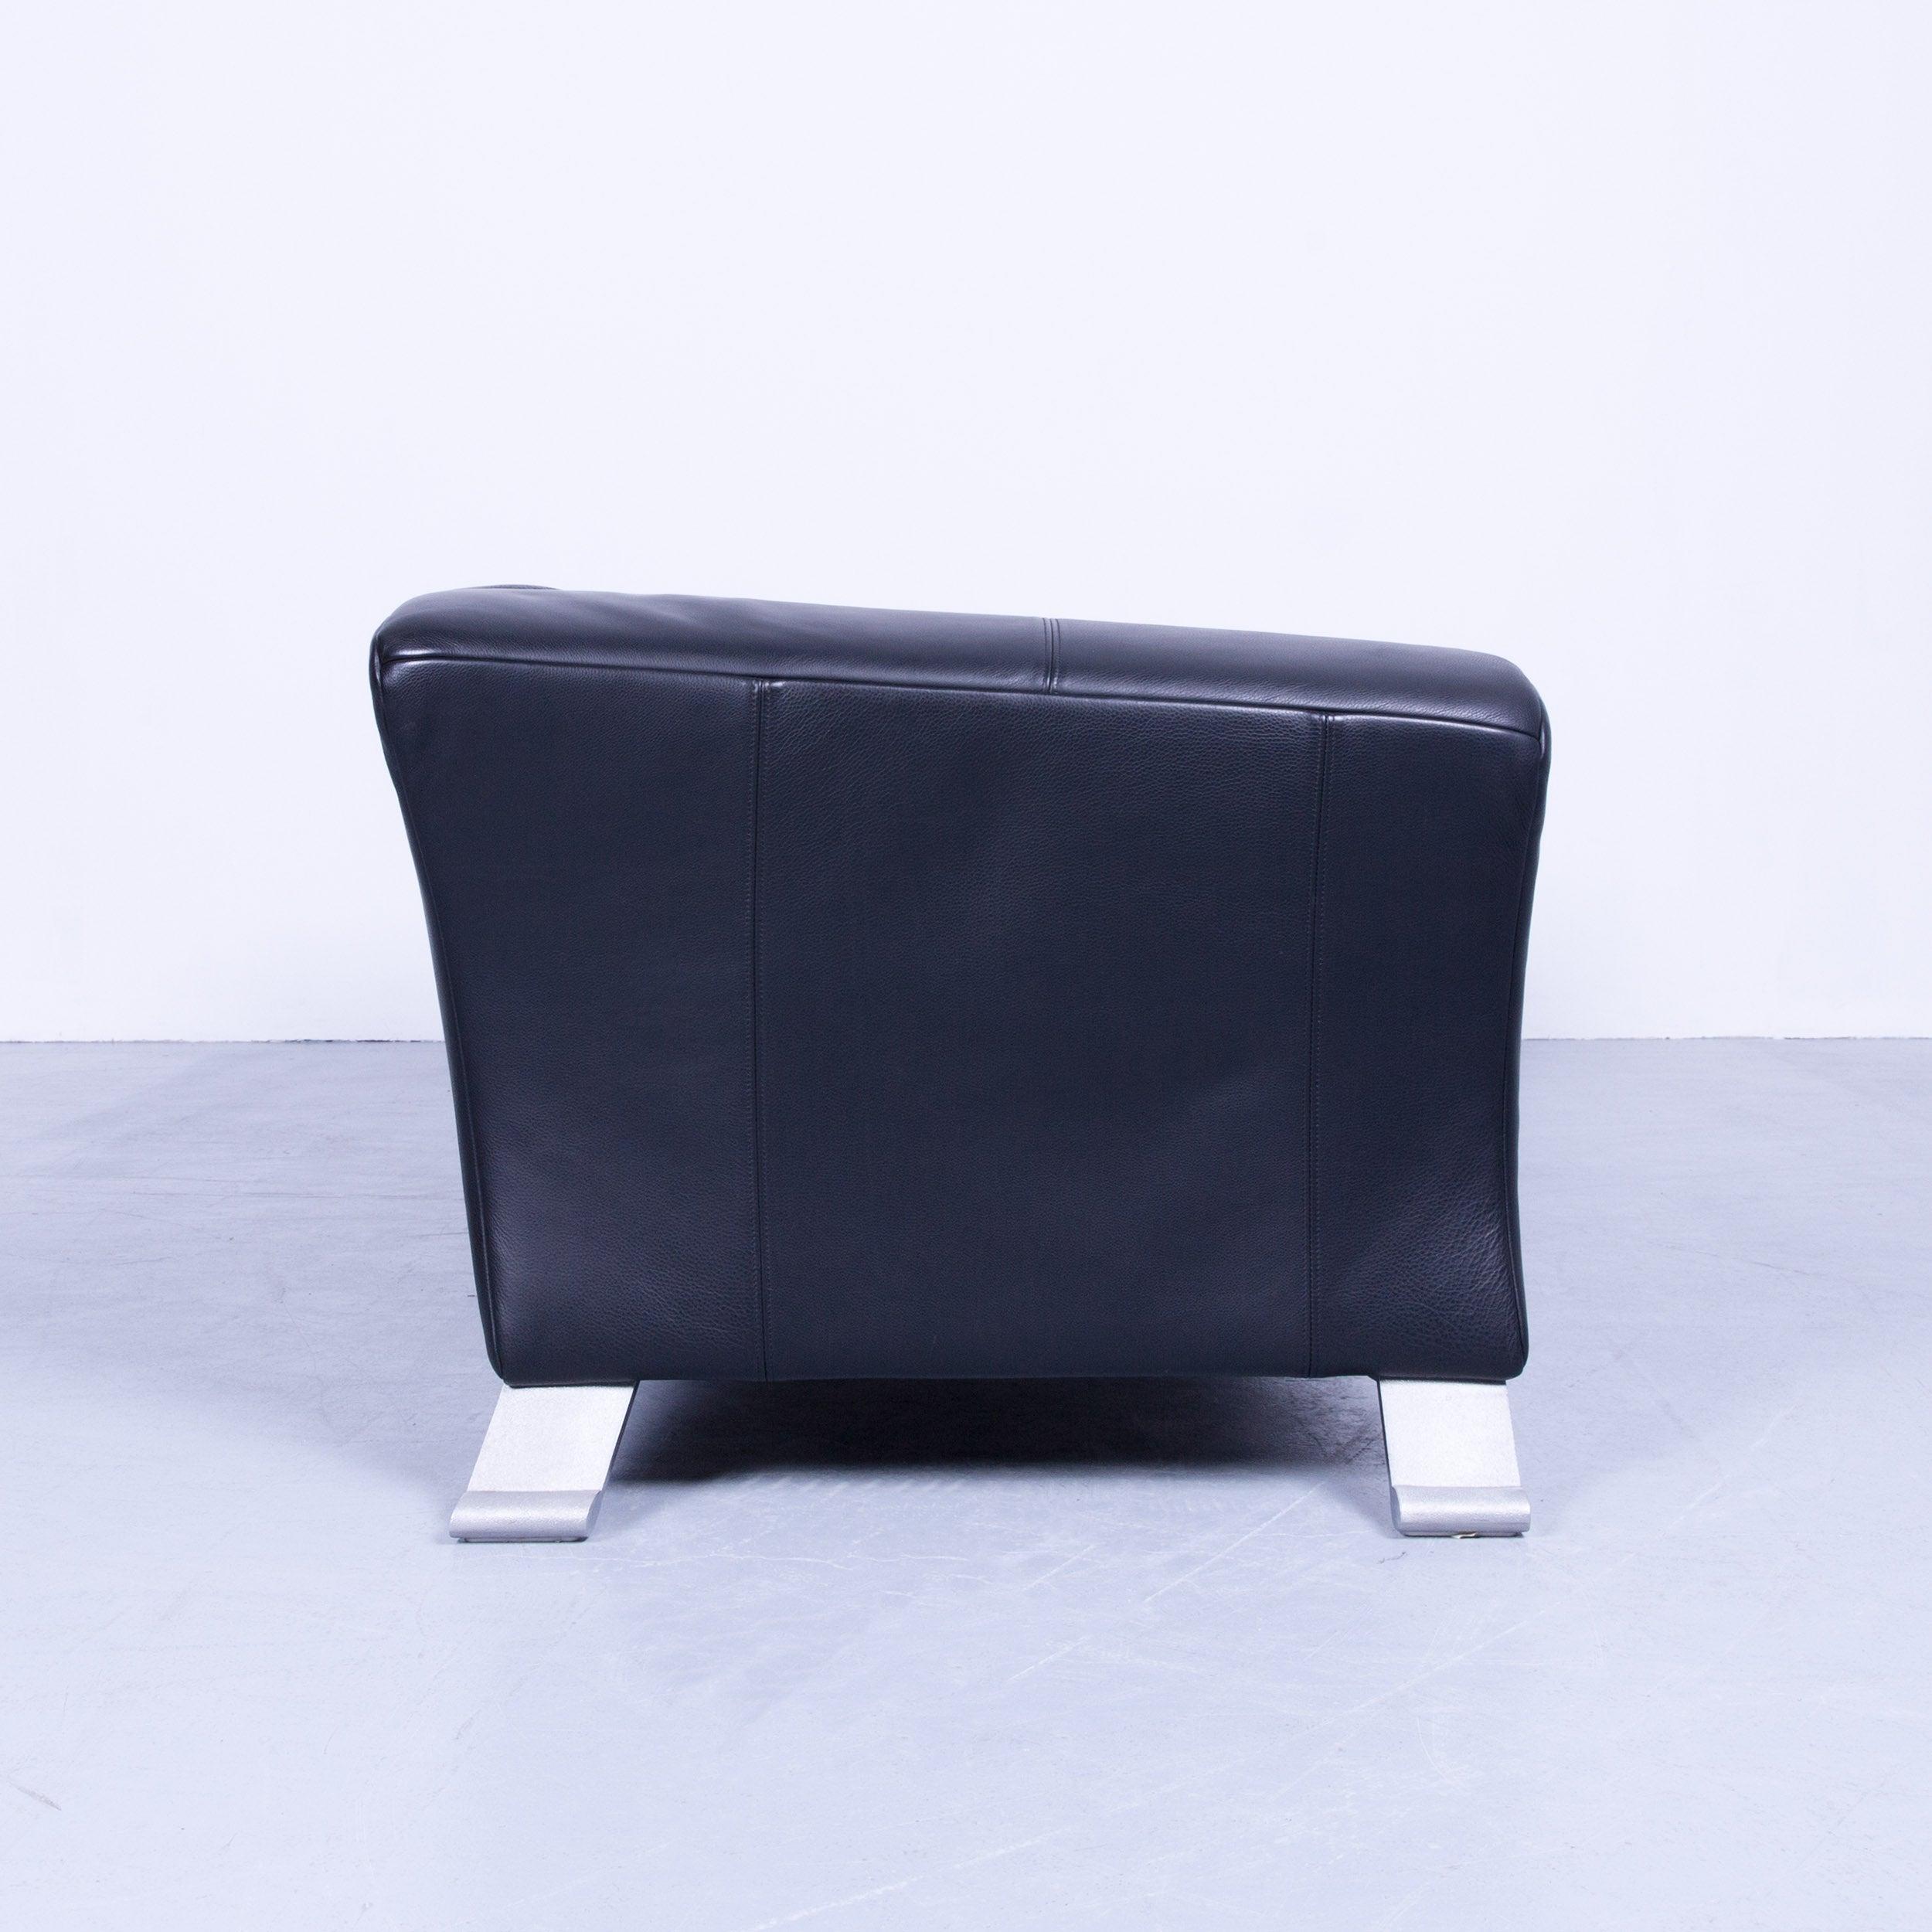 Rolf Benz Sofa Leder. Rolf Benz Designer Leather Sofa Black Three ...